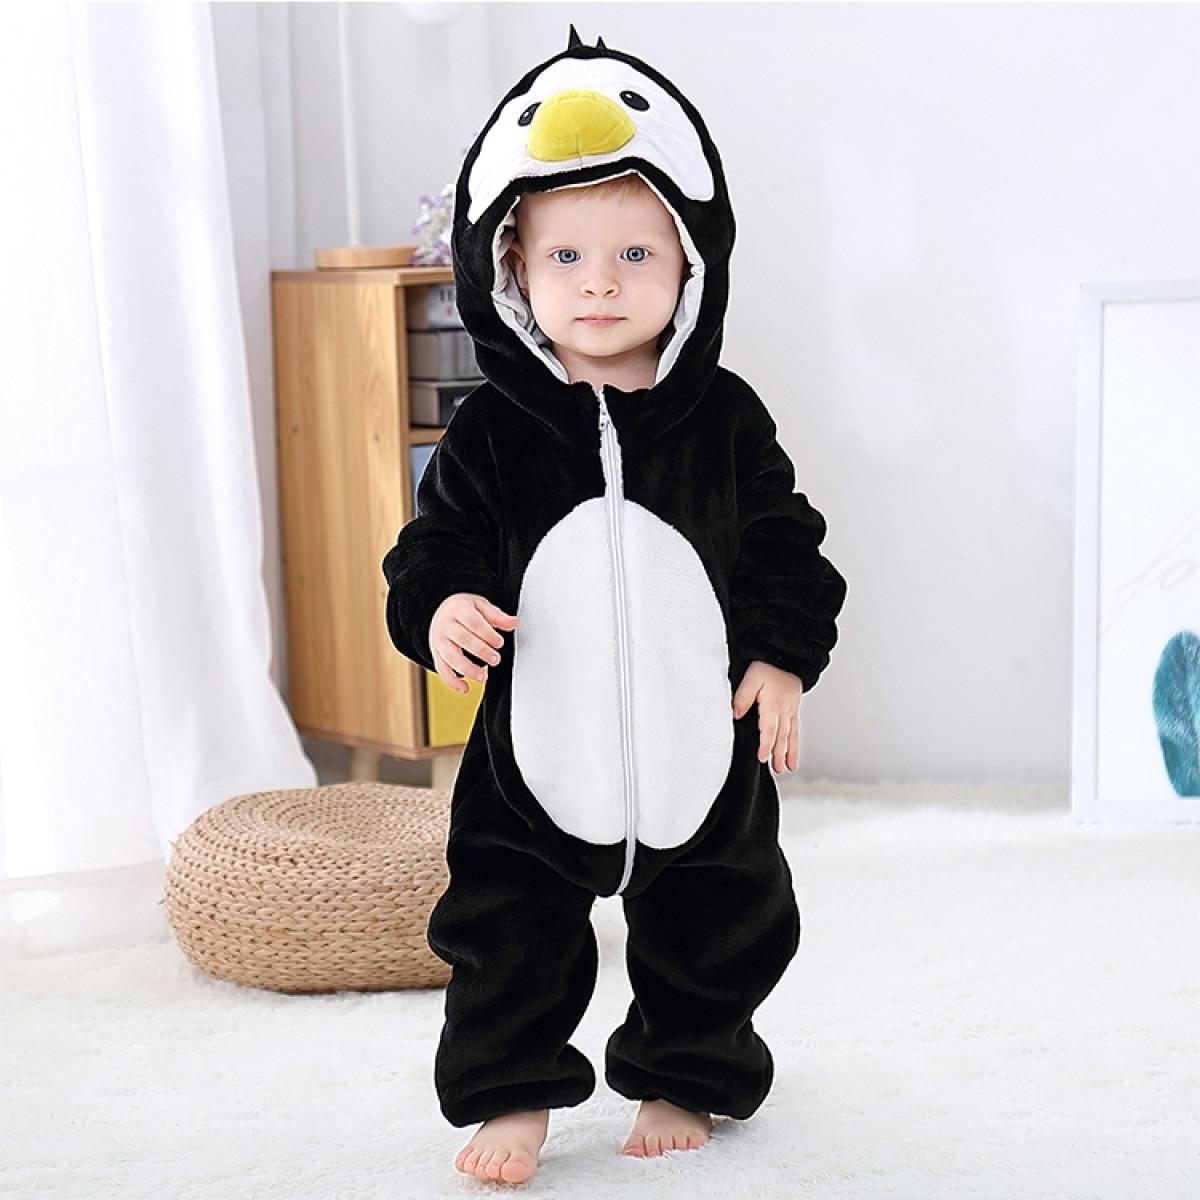 kostum za pingvina za maškare